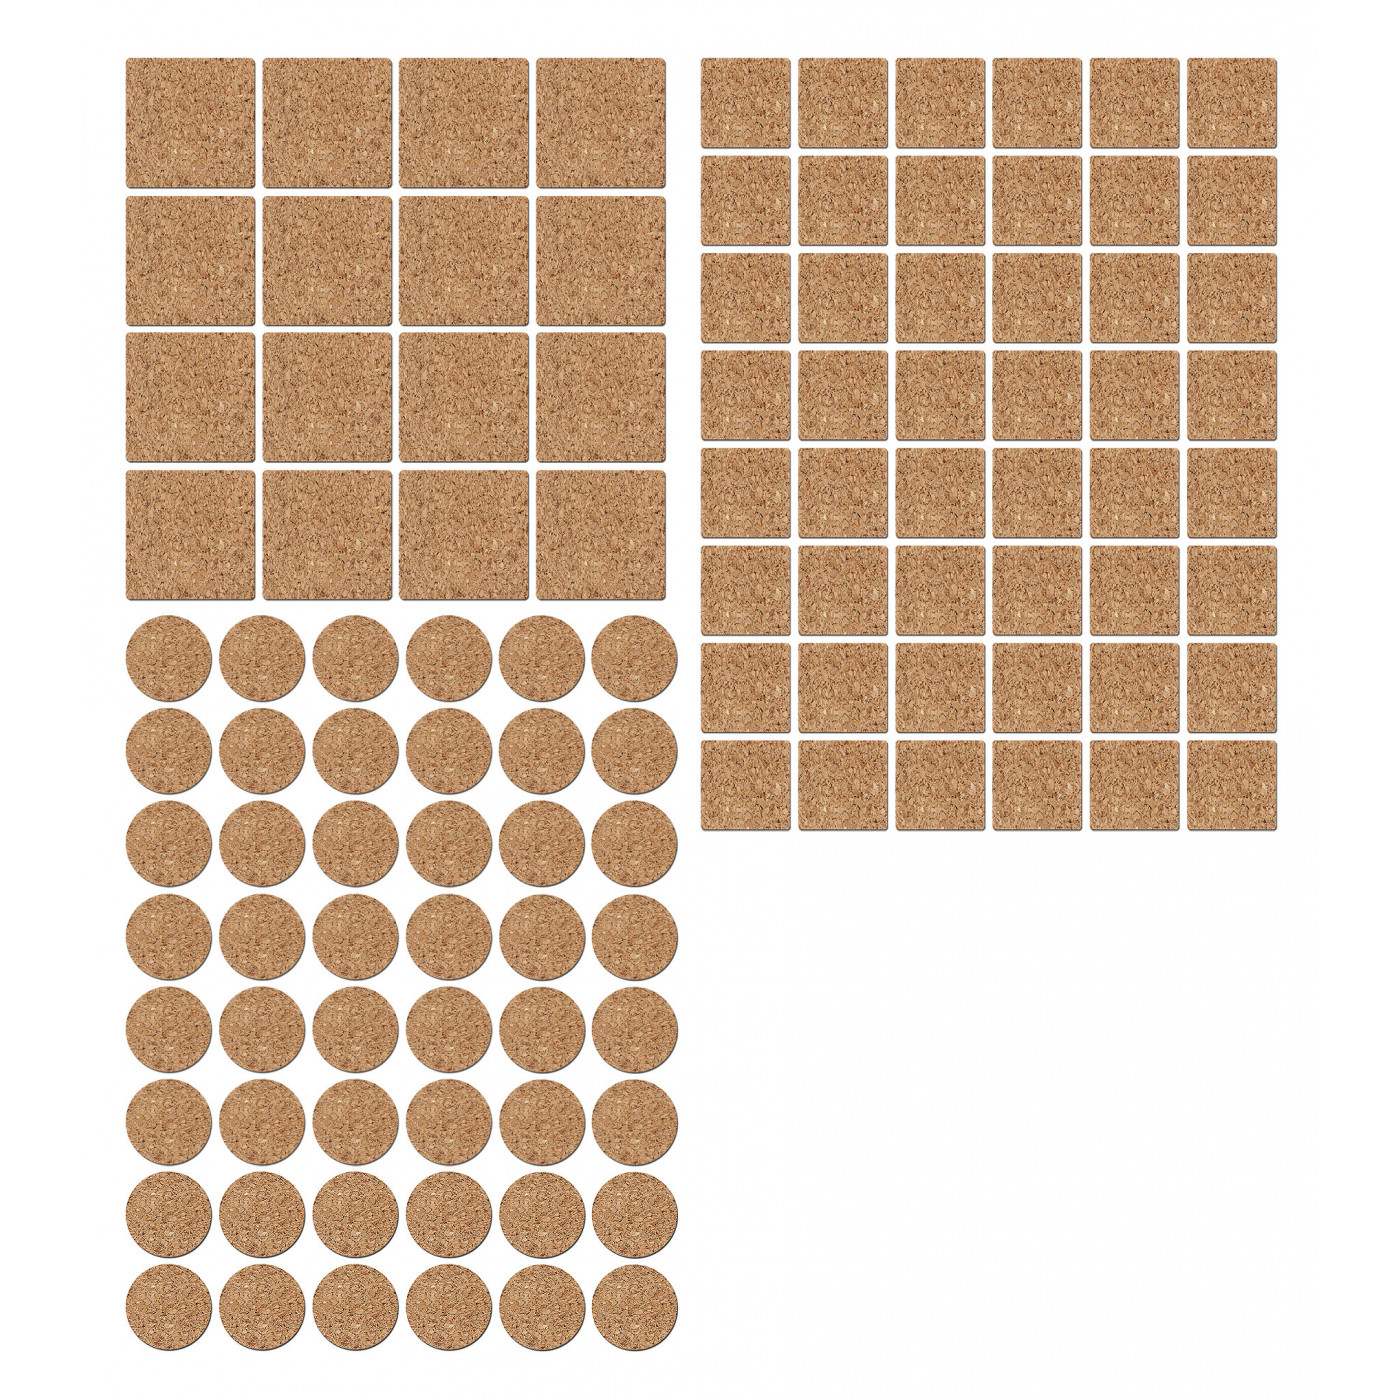 Set of 112 anti-scratch, anti-slip floor gliders (cork